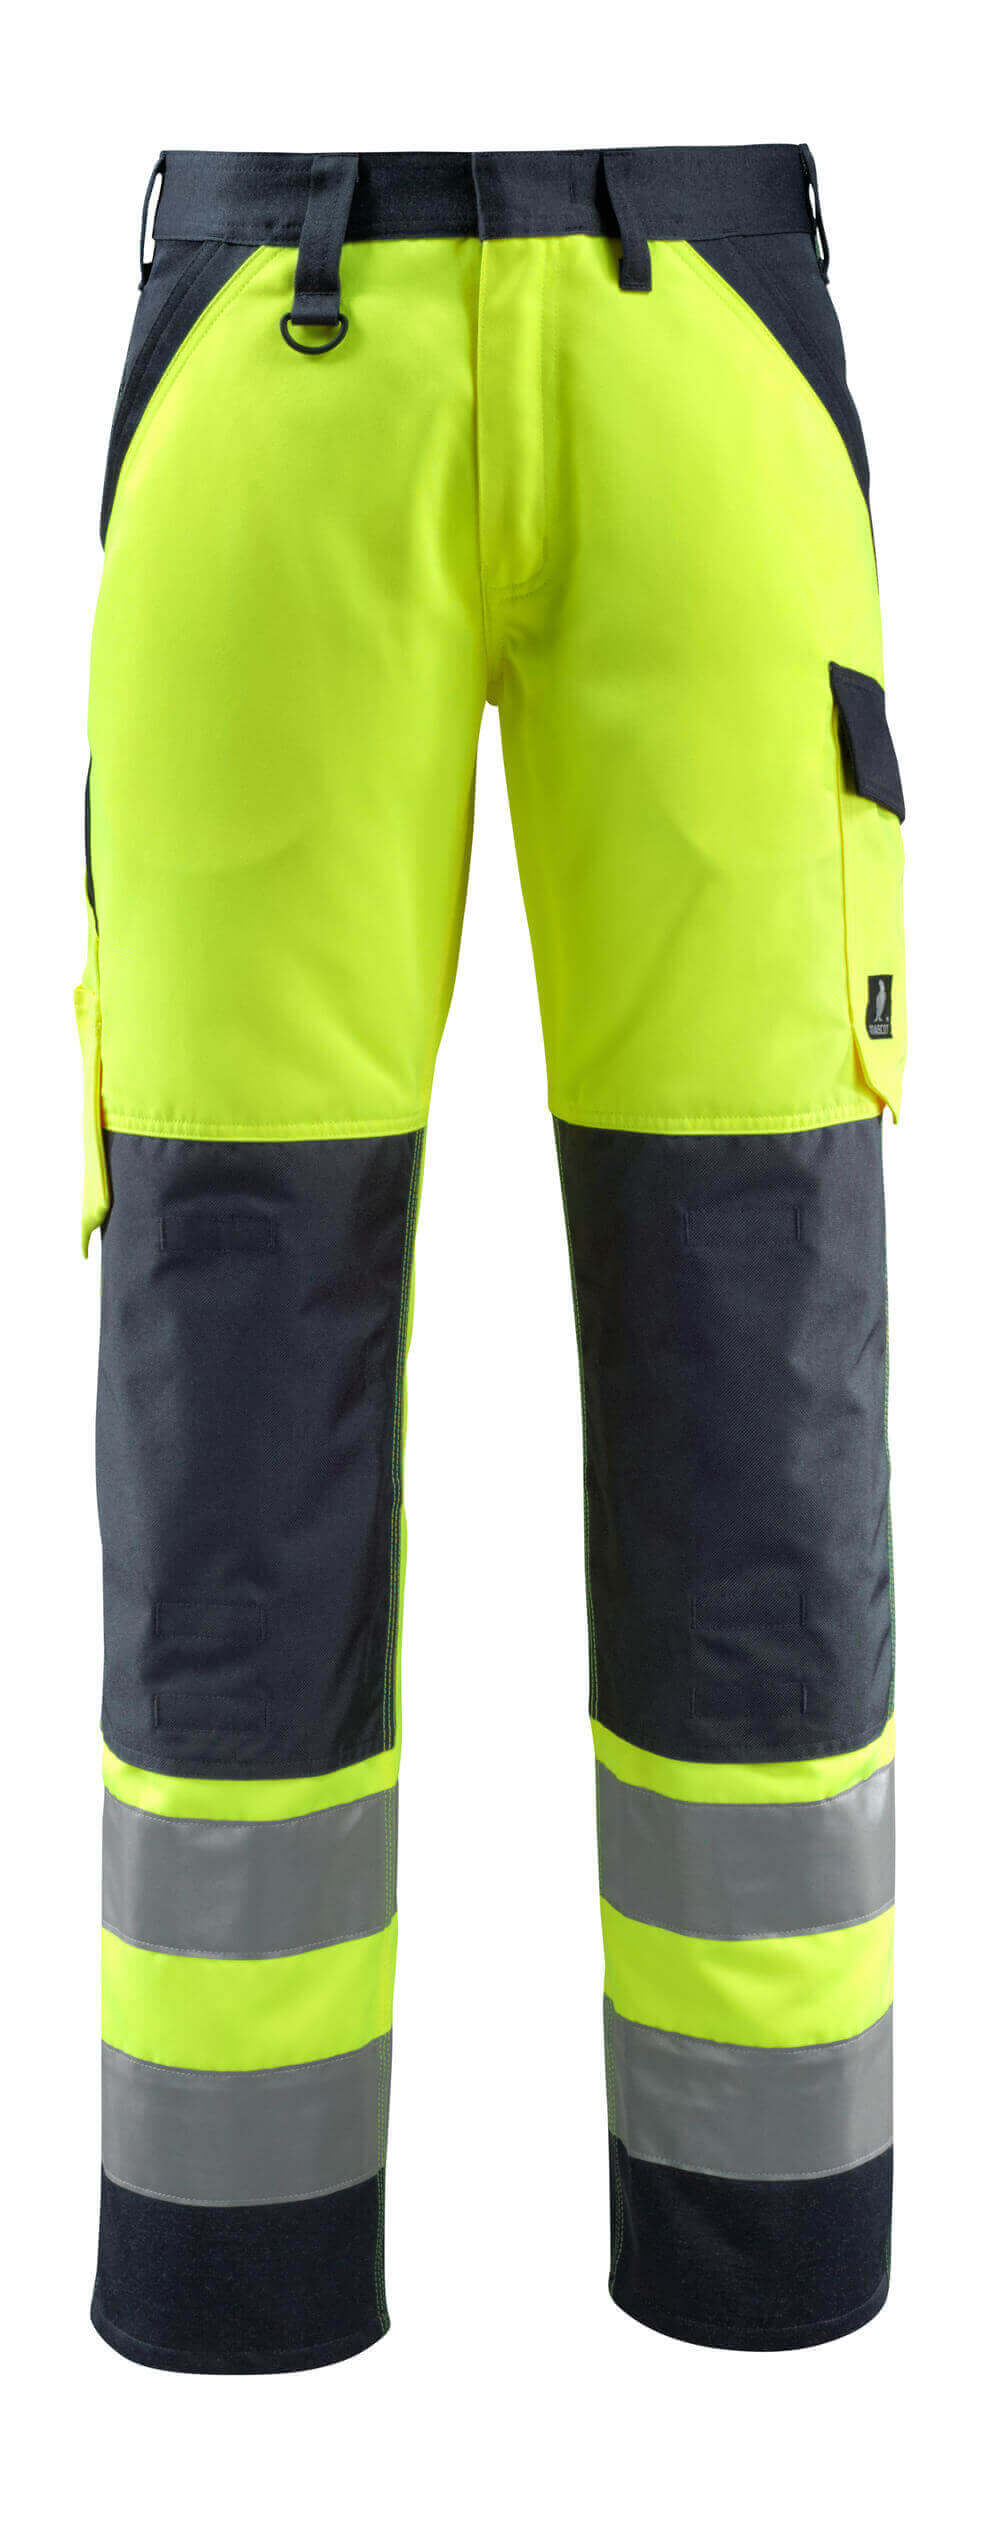 15979-948-17010 Pants with kneepad pockets - hi-vis yellow/dark navy